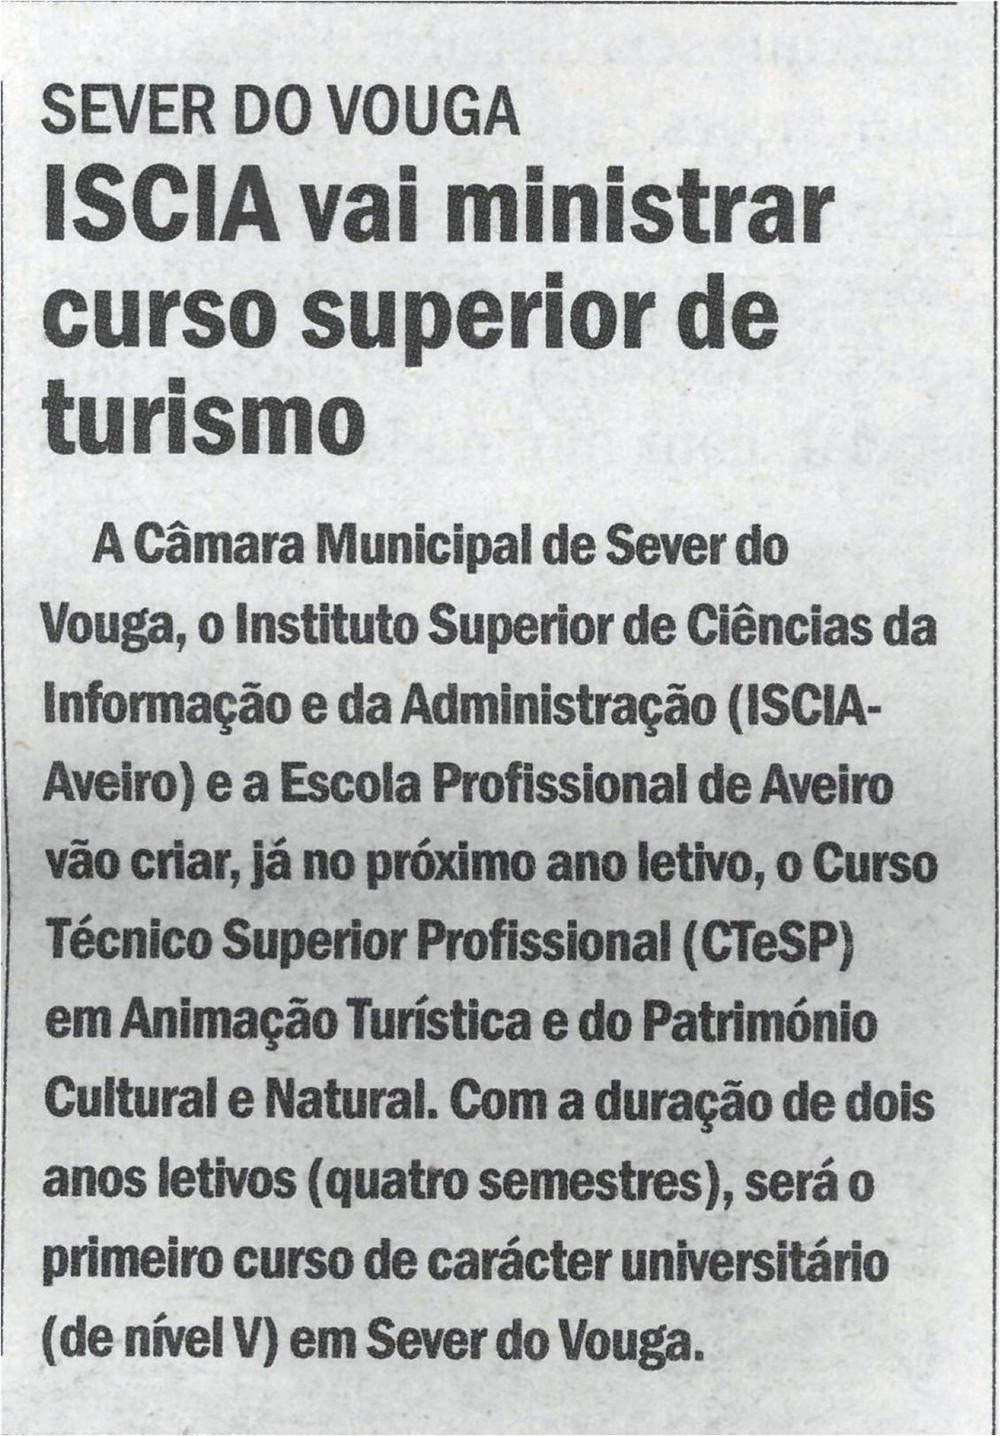 CV-21jul.'21-p.6-Sever do Vouga : ISCIA vai ministrar Curso Superior de Turismo.jpg